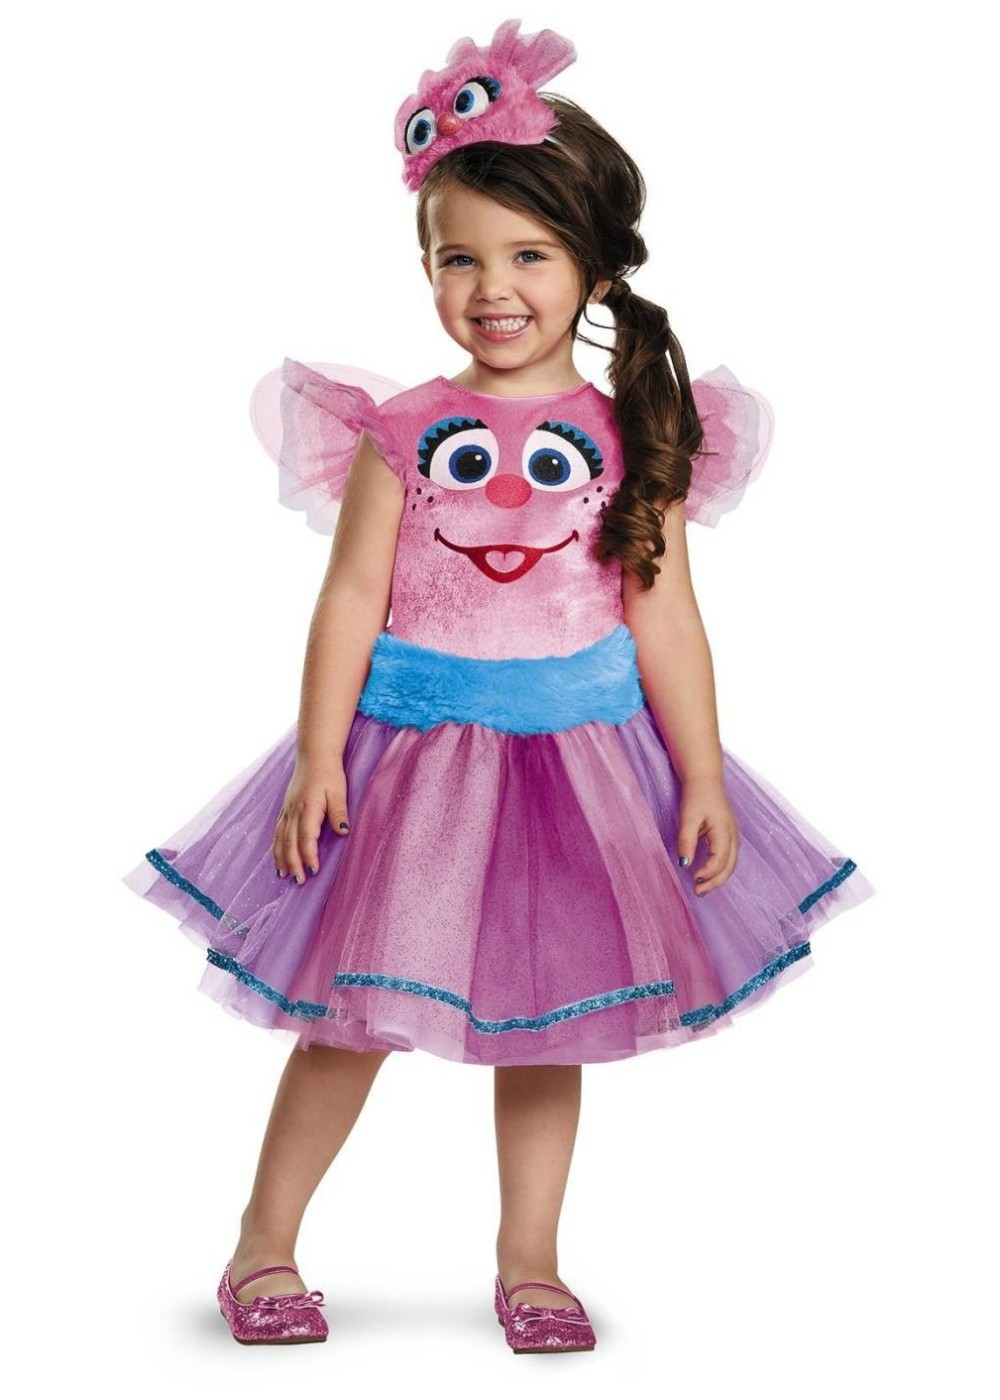 Toddler Girl Dress Shoes